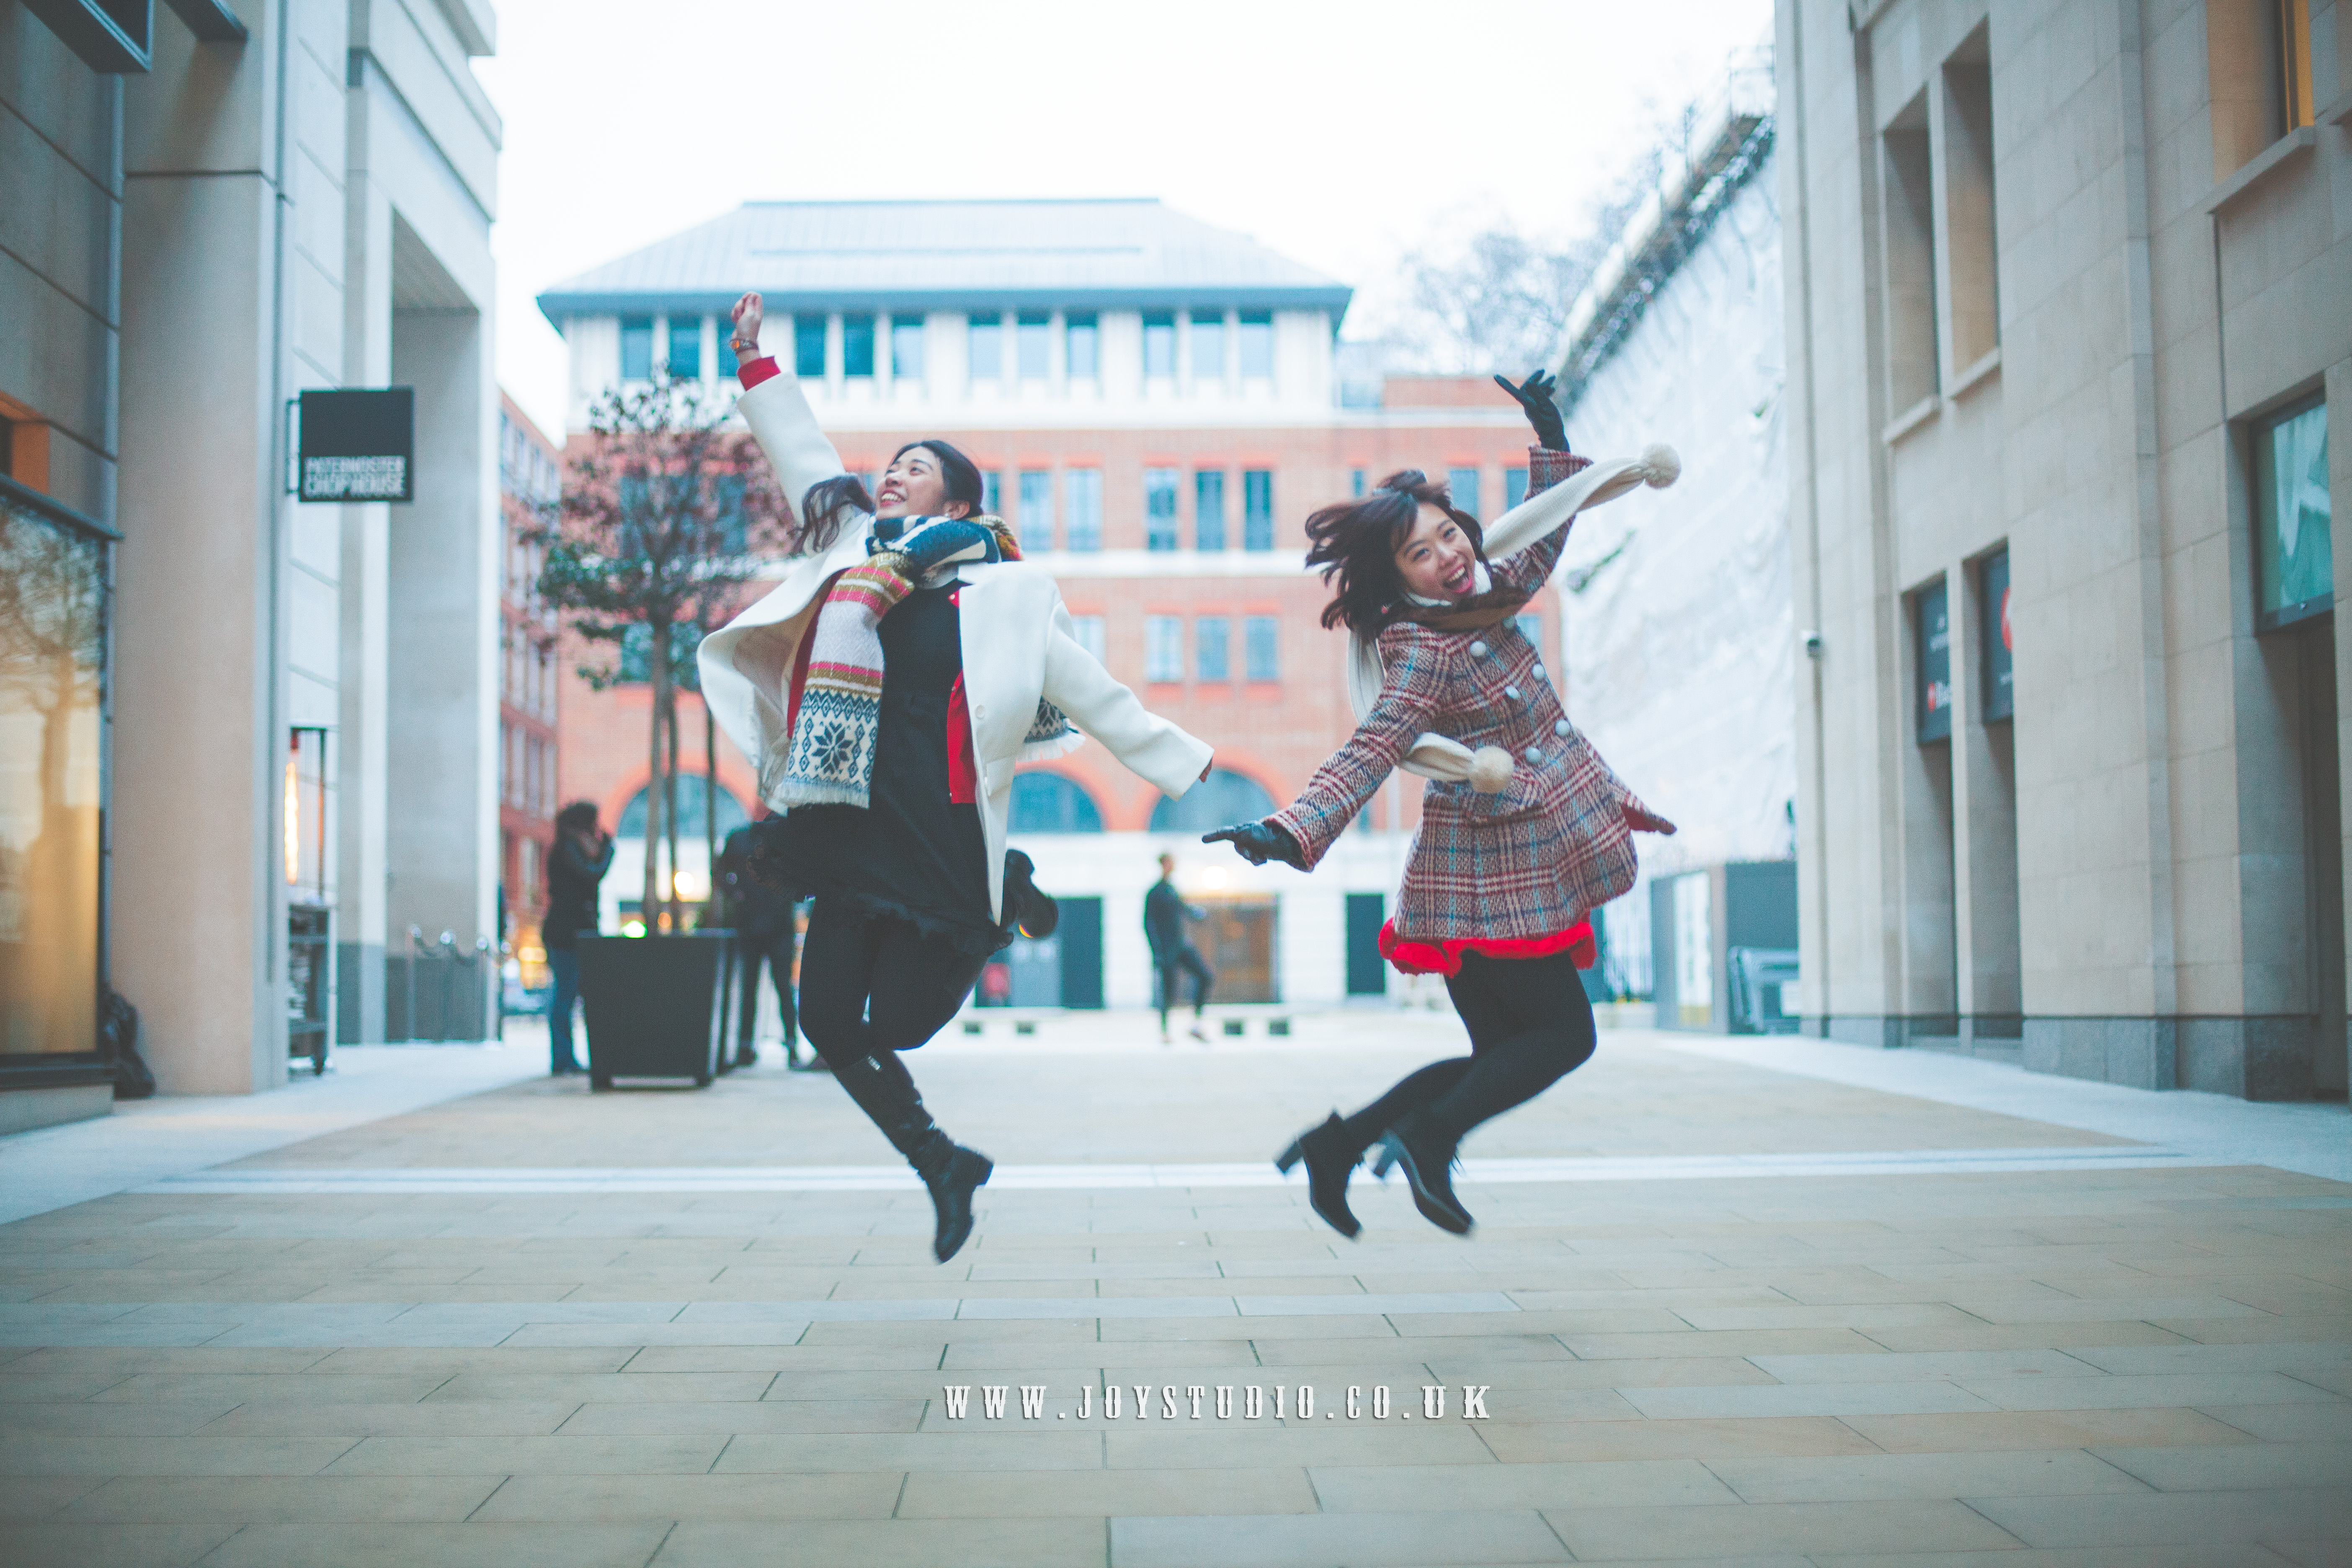 London Photography By Joy Studio